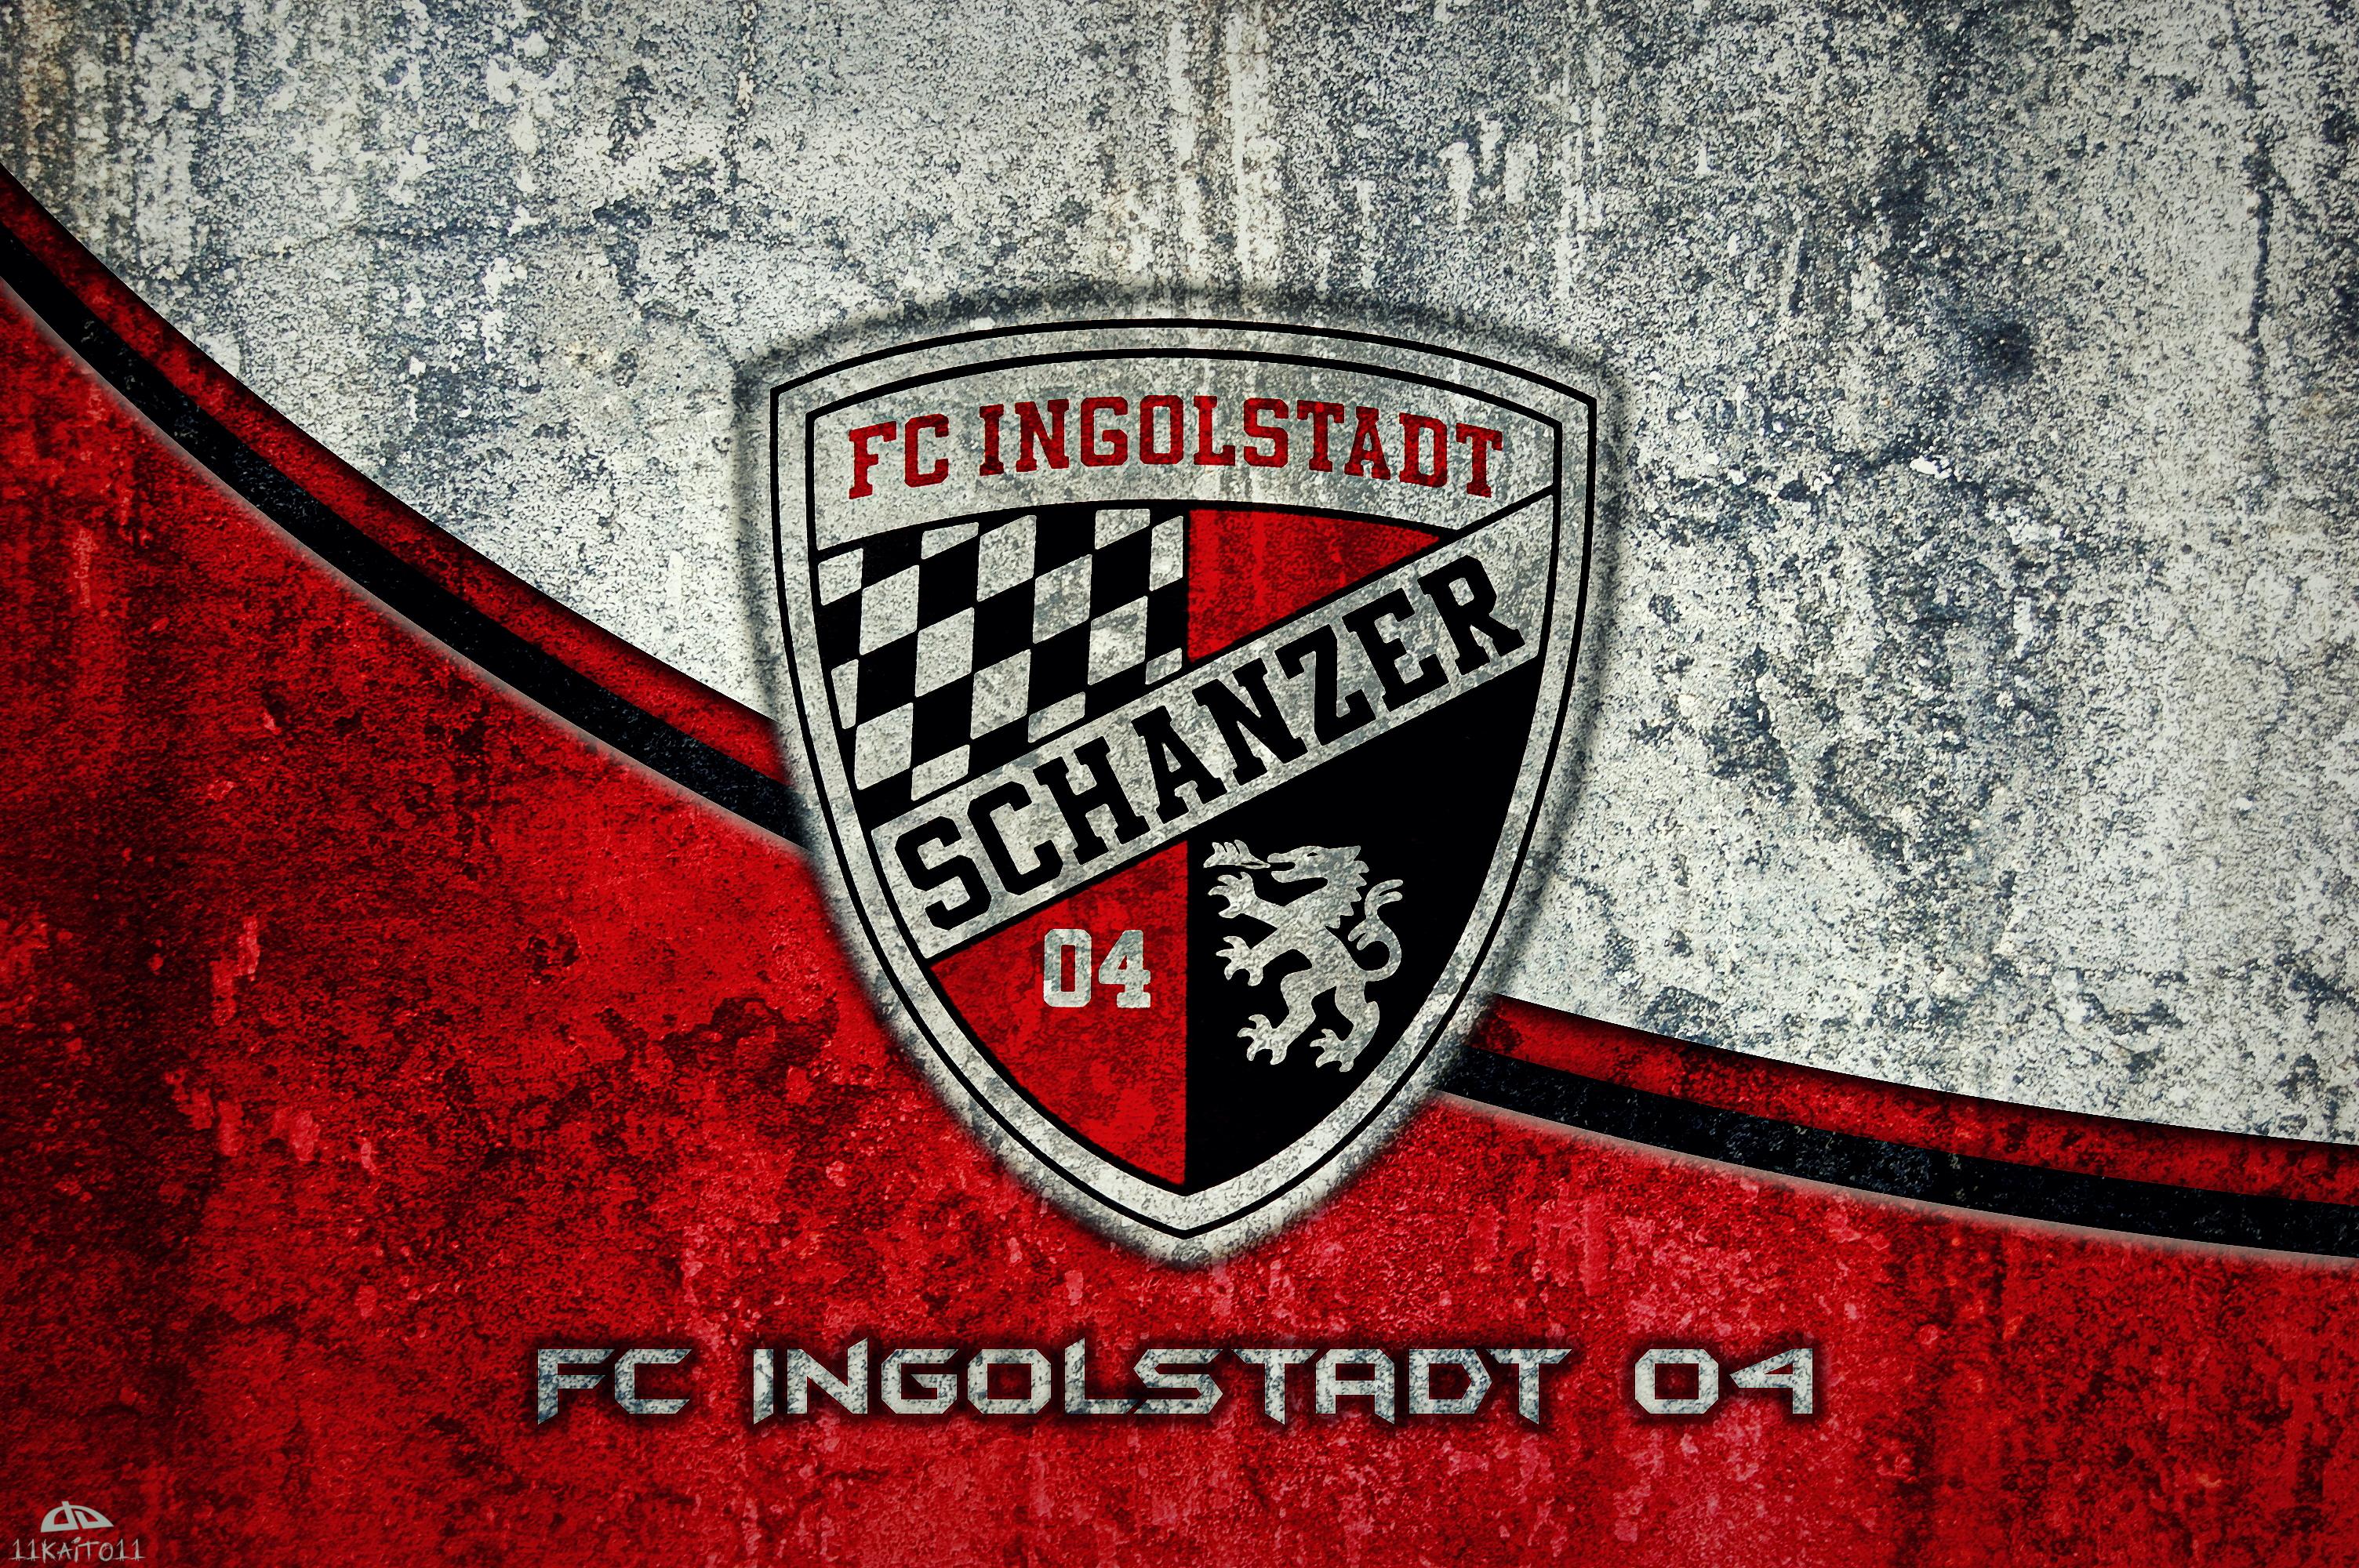 1 Fc Köln Ingolstadt